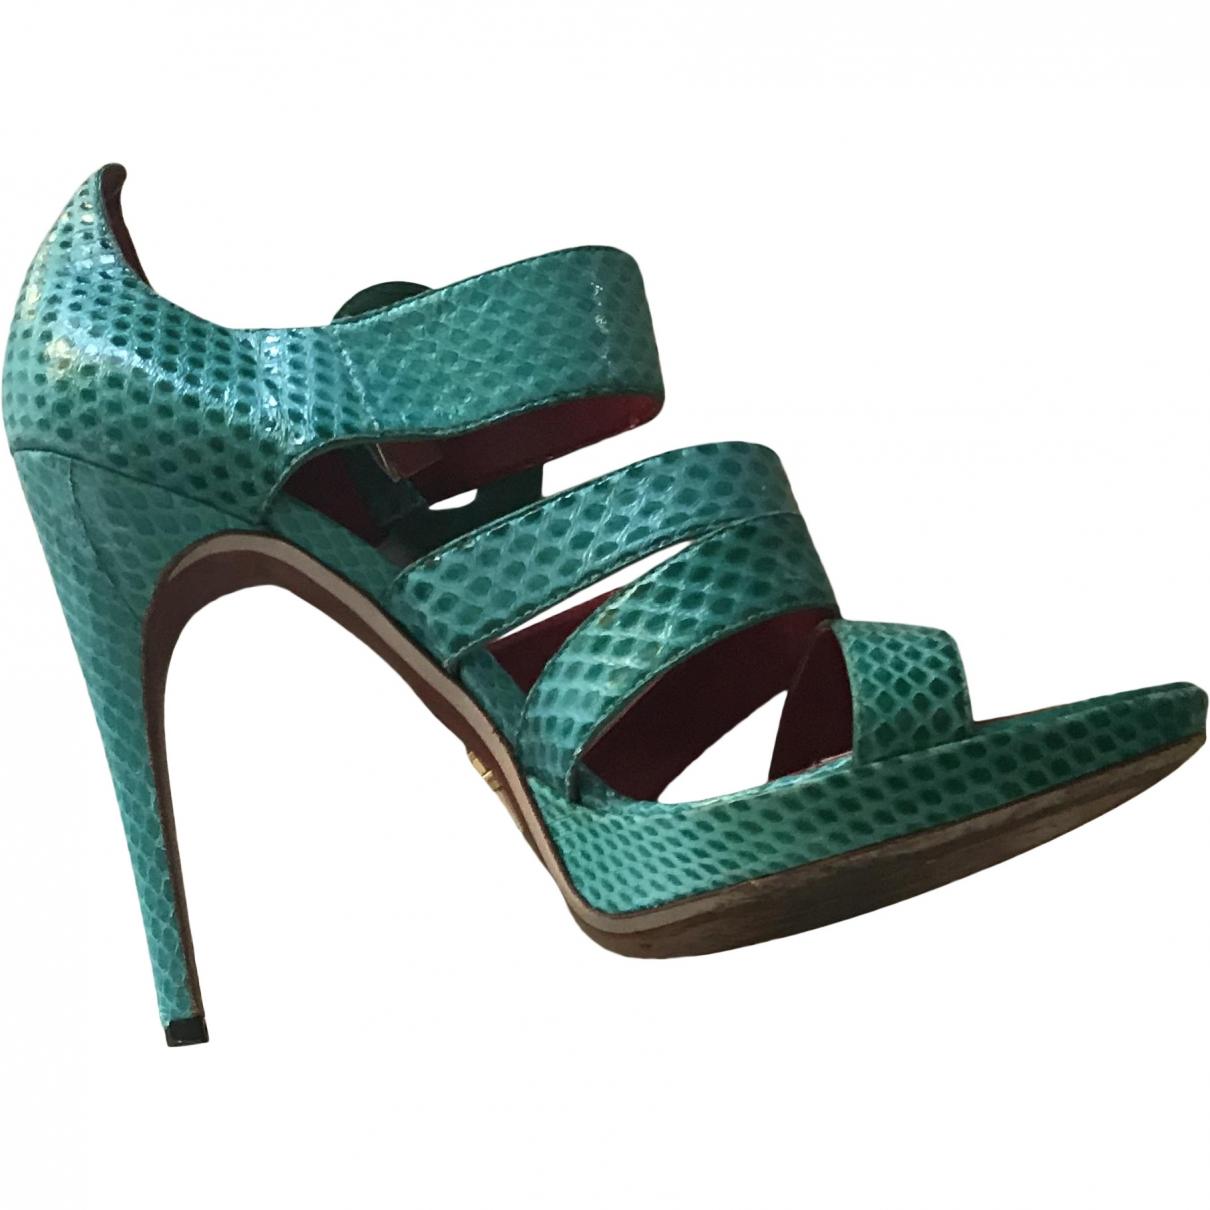 Cesare Paciotti \N Green Python Sandals for Women 40 EU